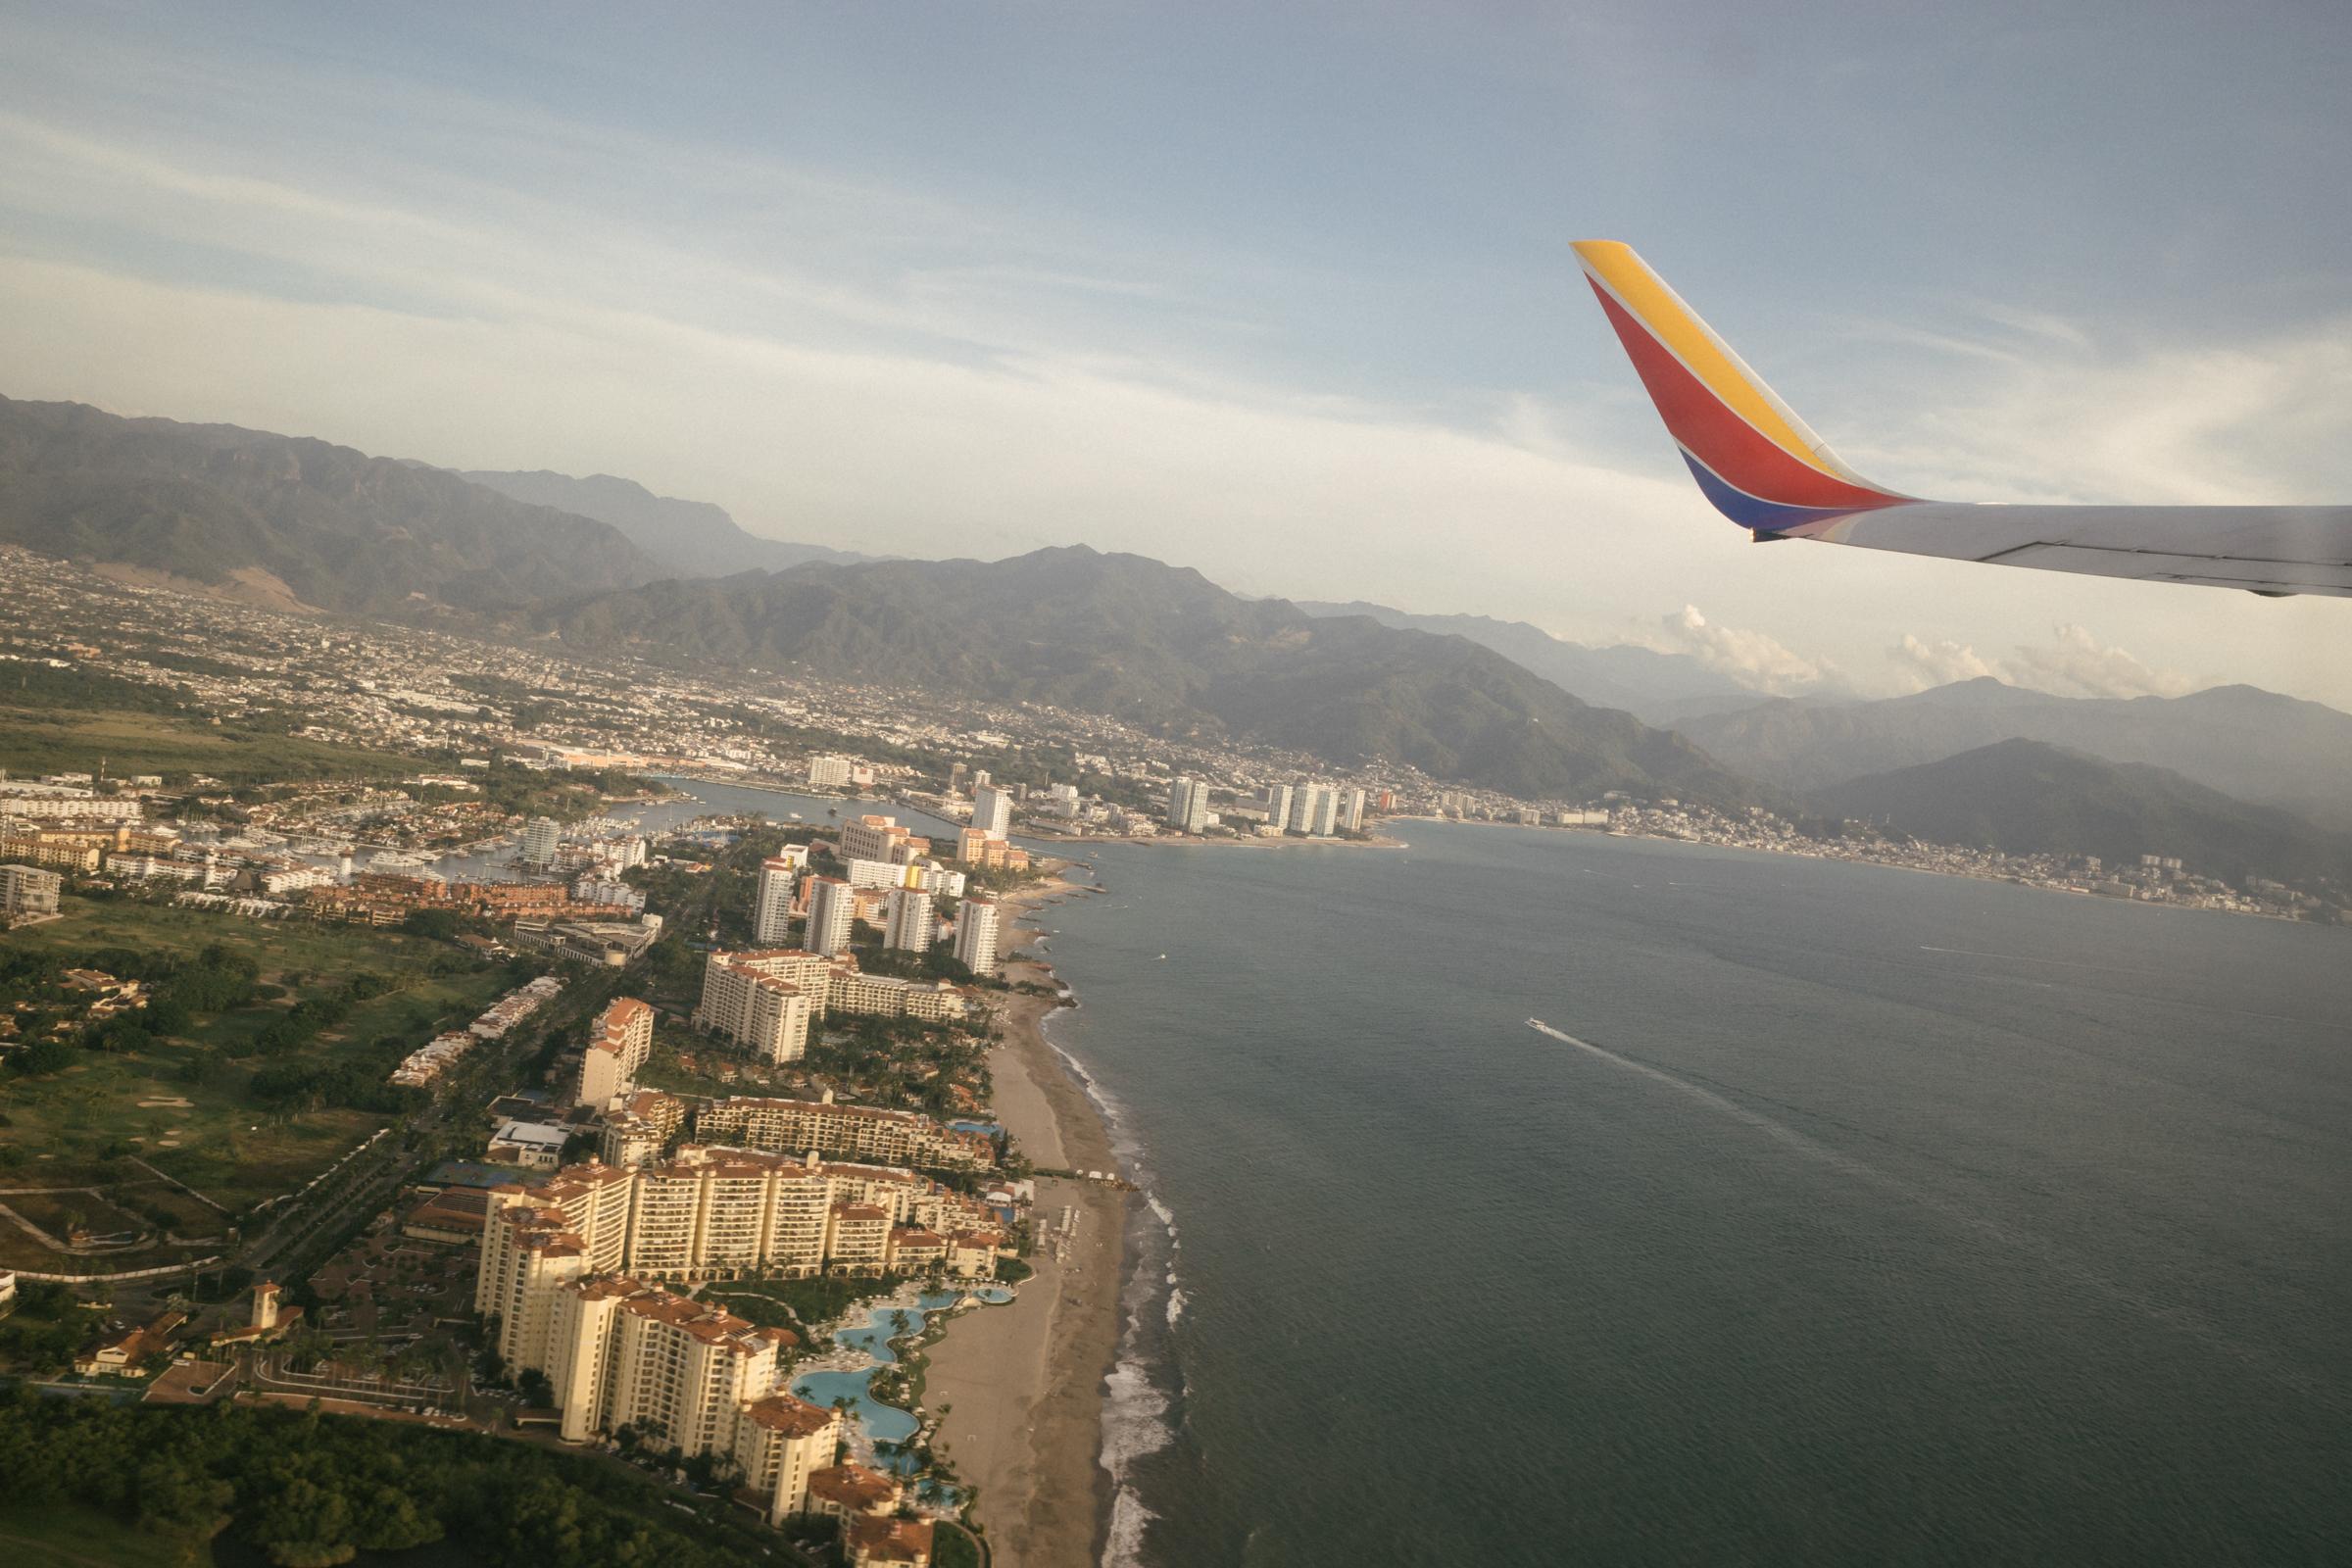 Southwest flying into Puerto Vallarta